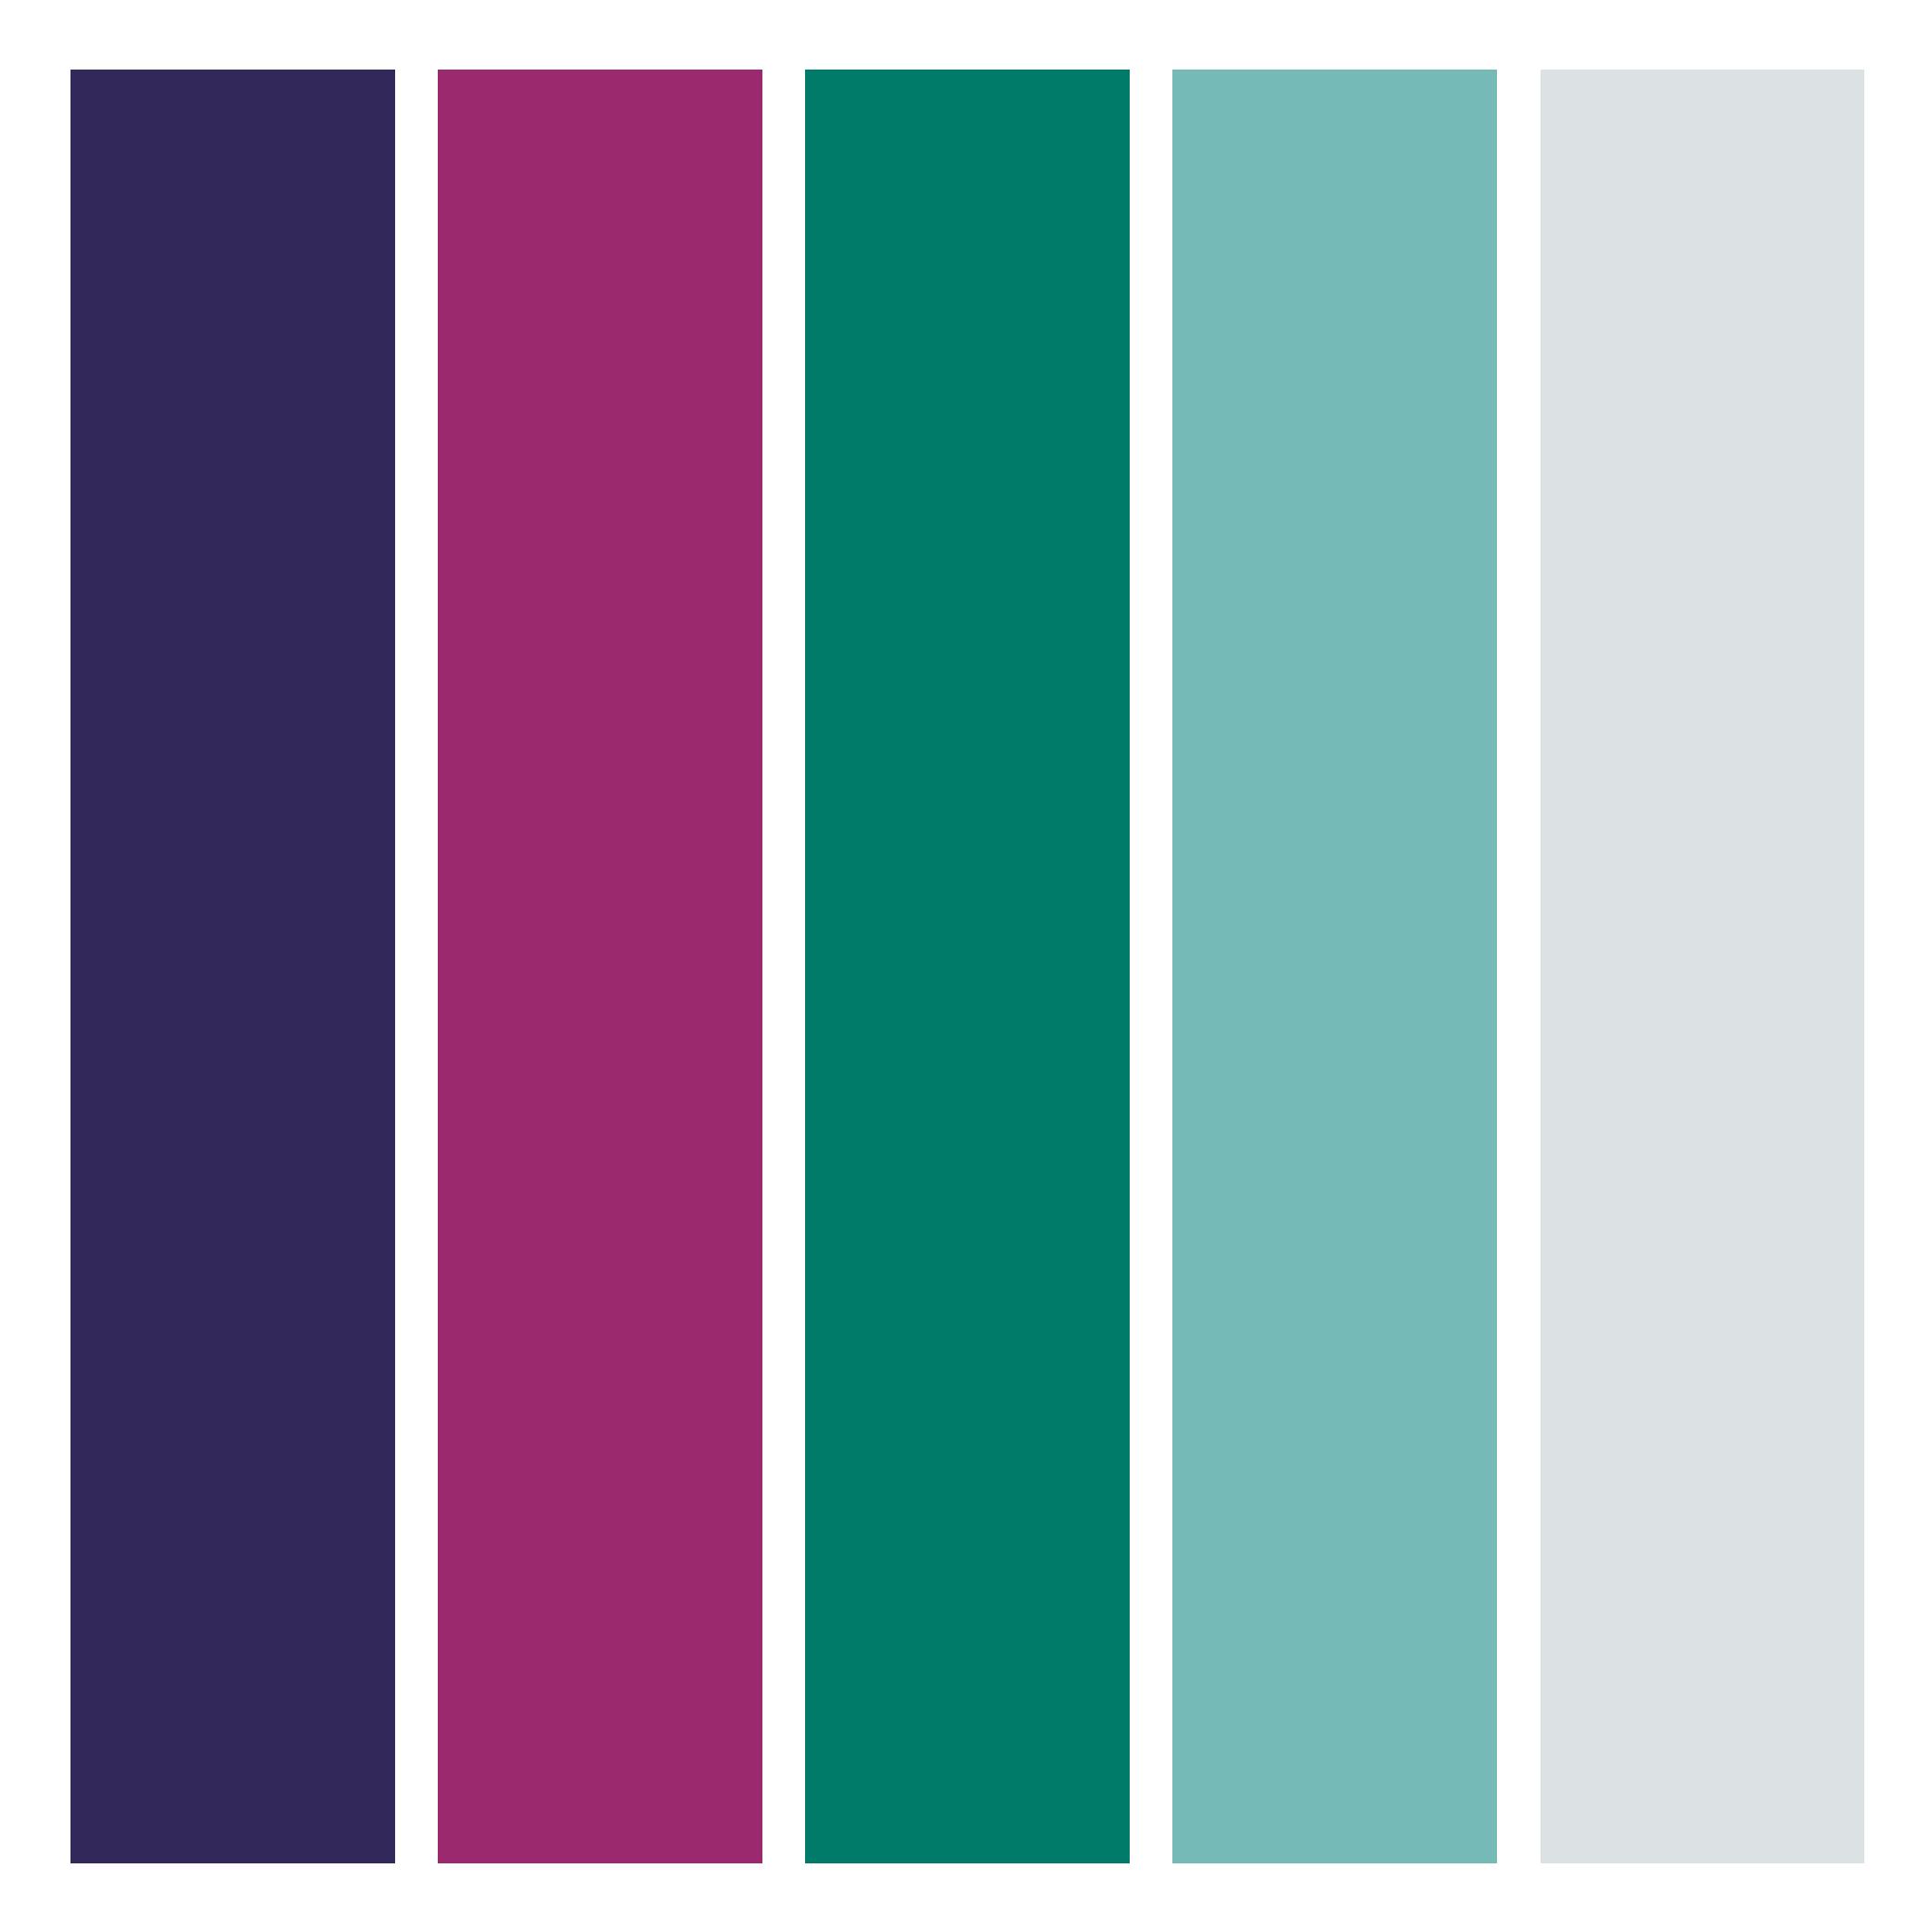 Brand-Color-palette-41.png